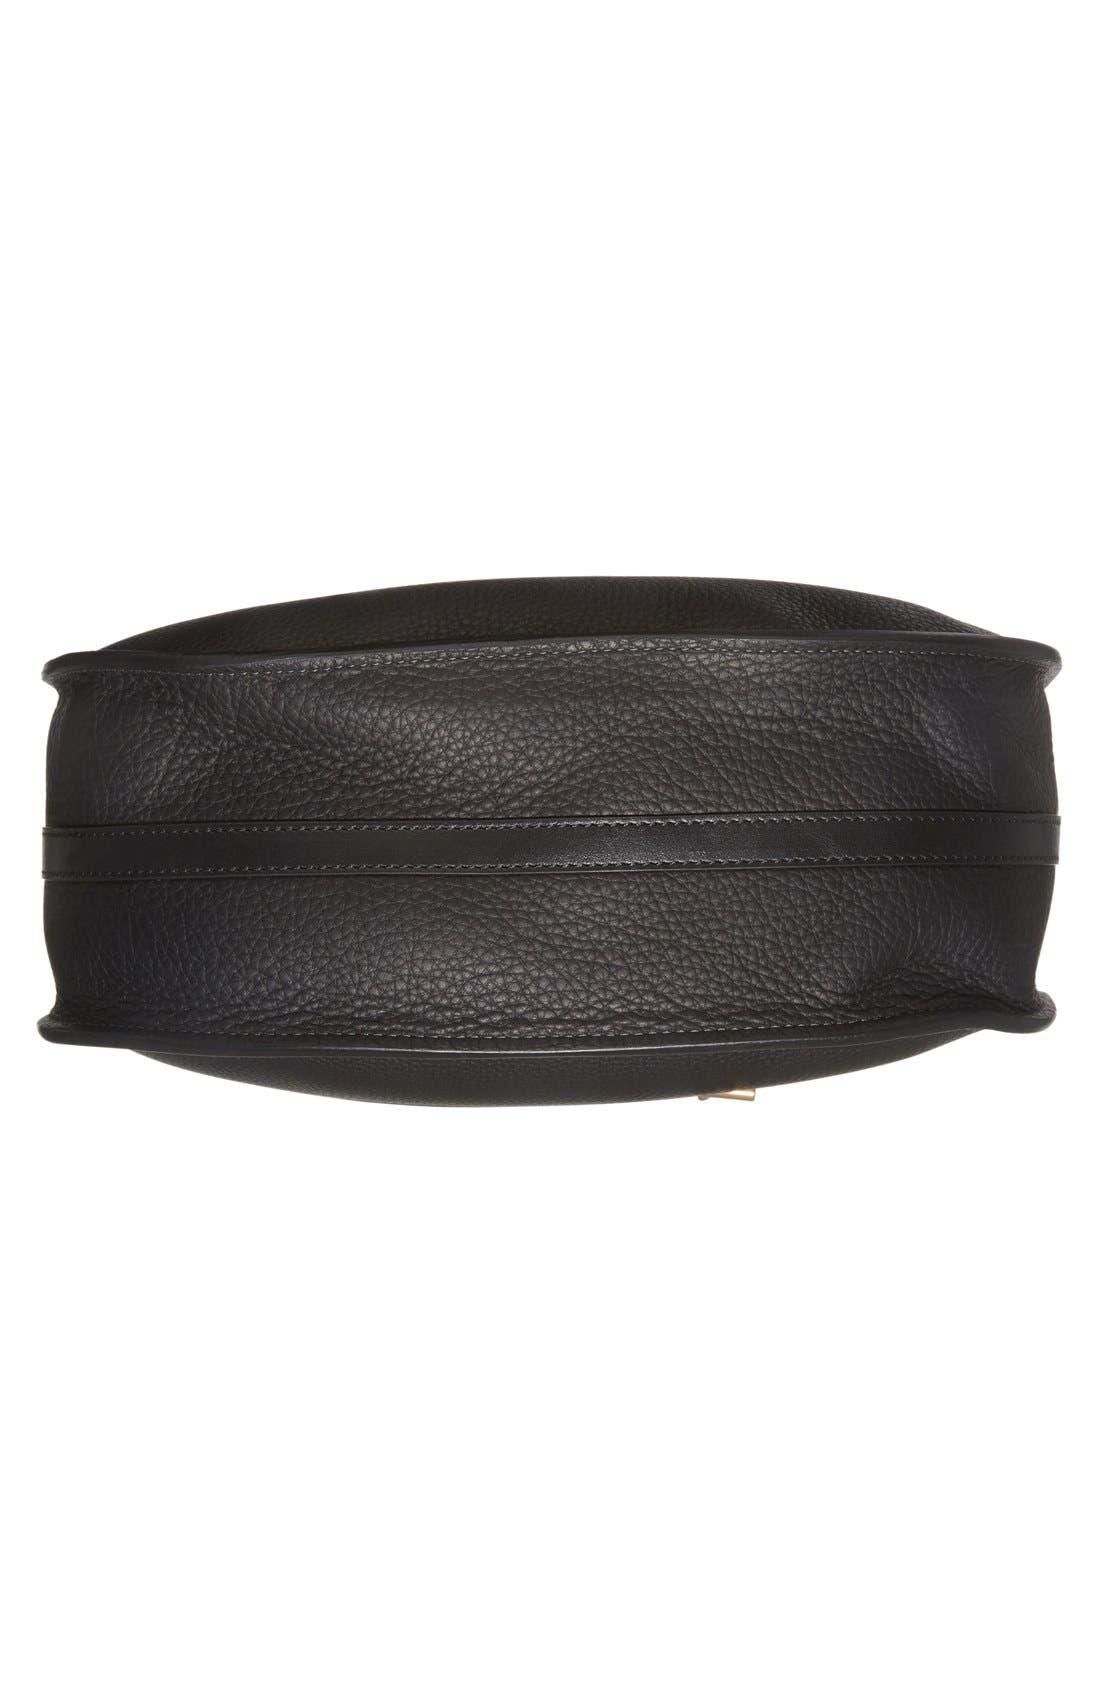 'Small Hayley' Leather Hobo Bag,                             Alternate thumbnail 6, color,                             Black